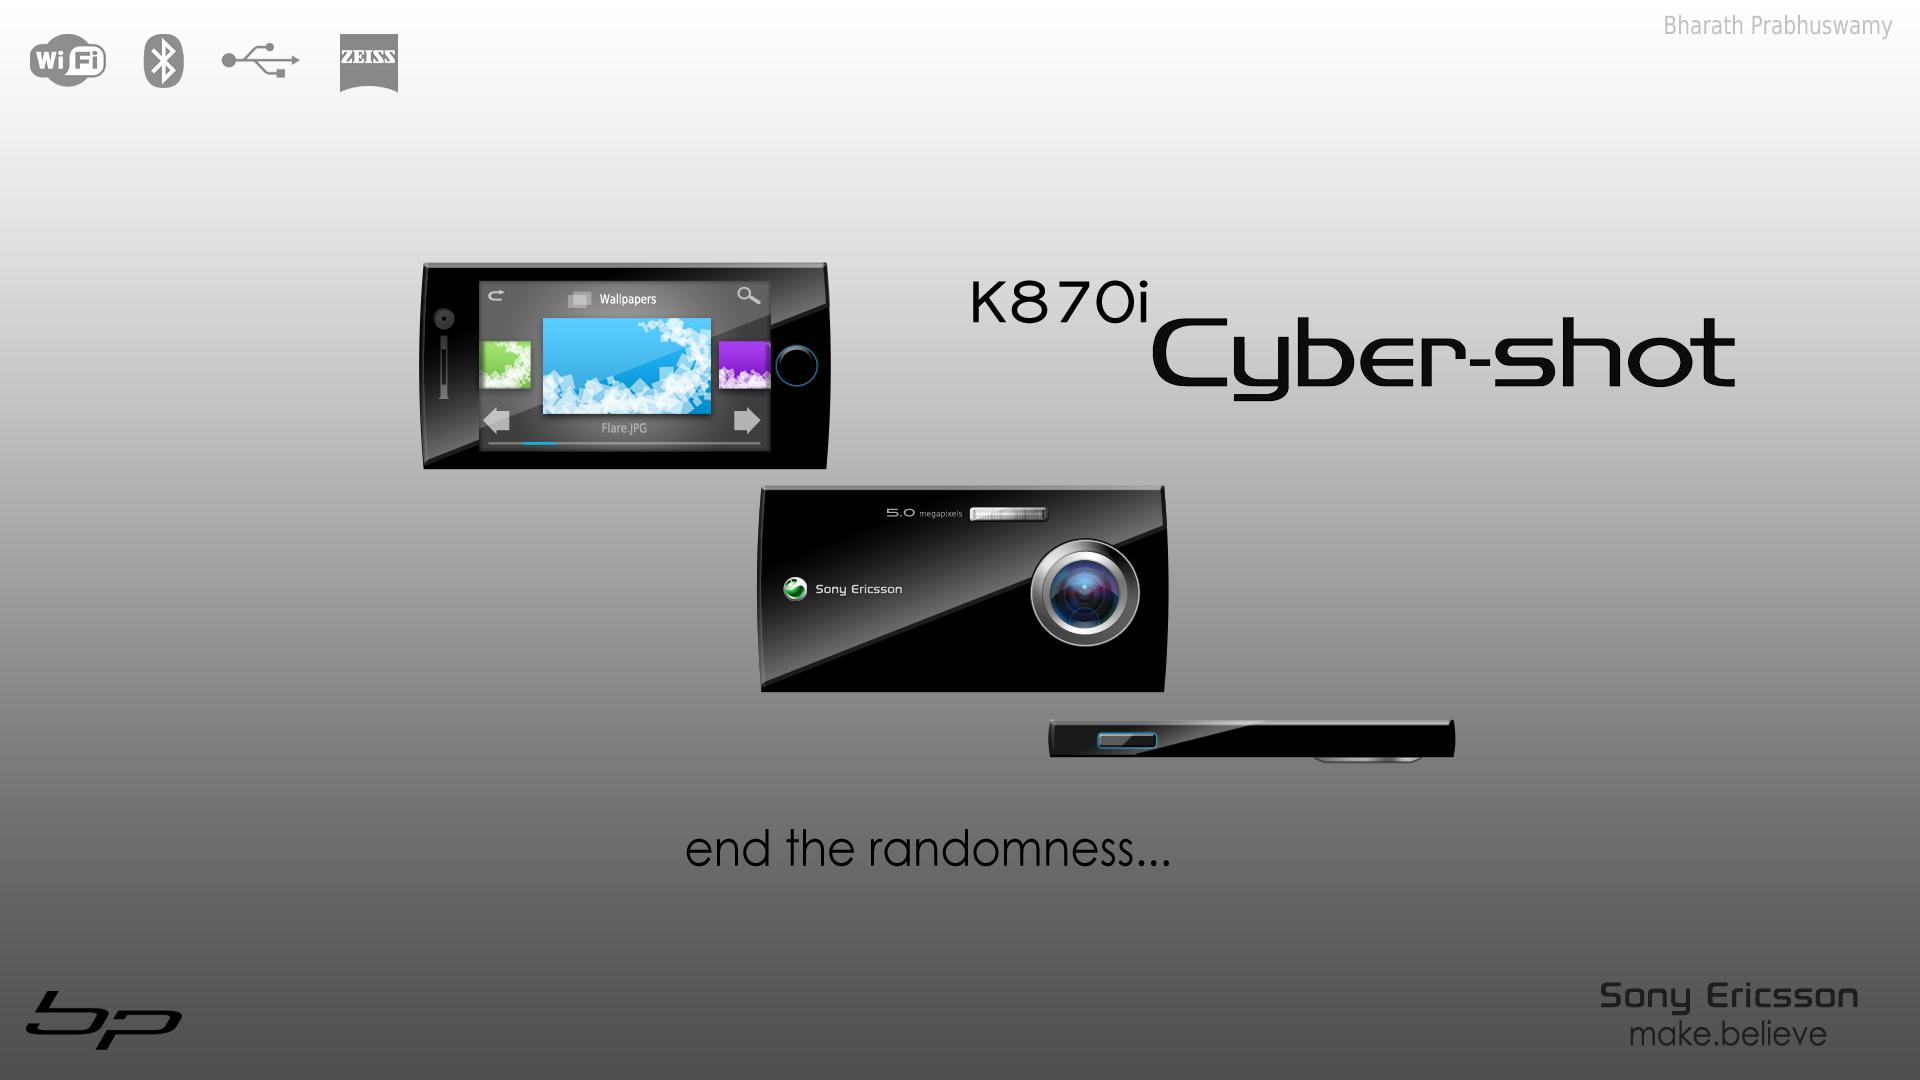 Sony Ericsson K870i - Part 2